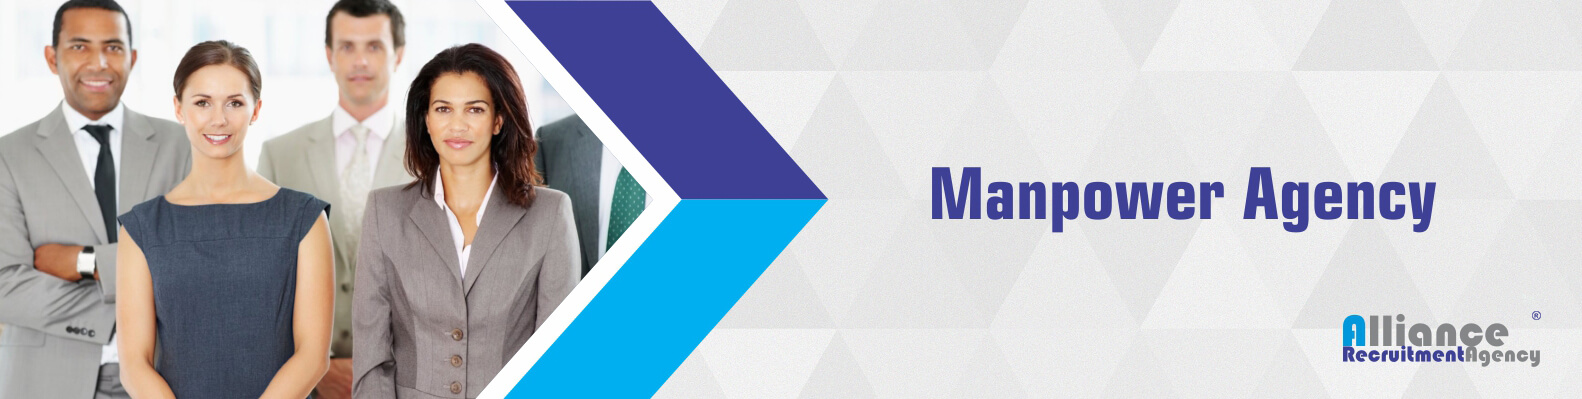 Manpower Recruitment Agency - Manpower Recruitment Agency in India